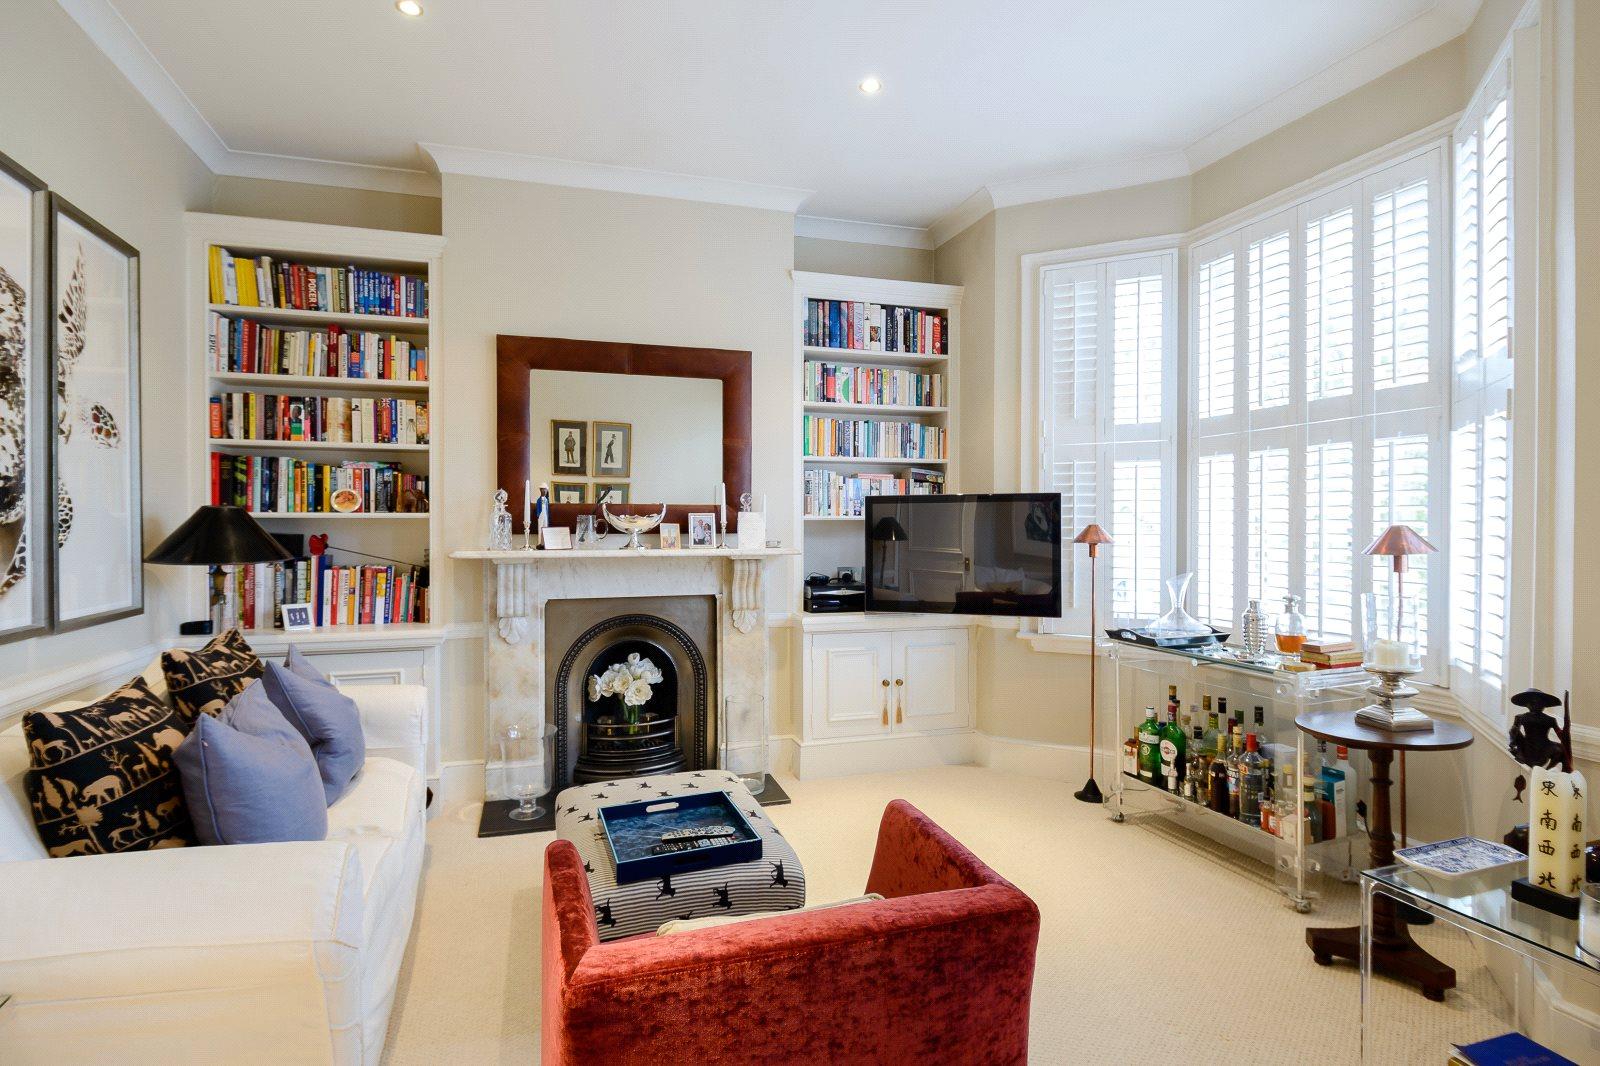 Апартаменты / Квартиры для того Продажа на Gironde Road, London, SW6 London, Англия